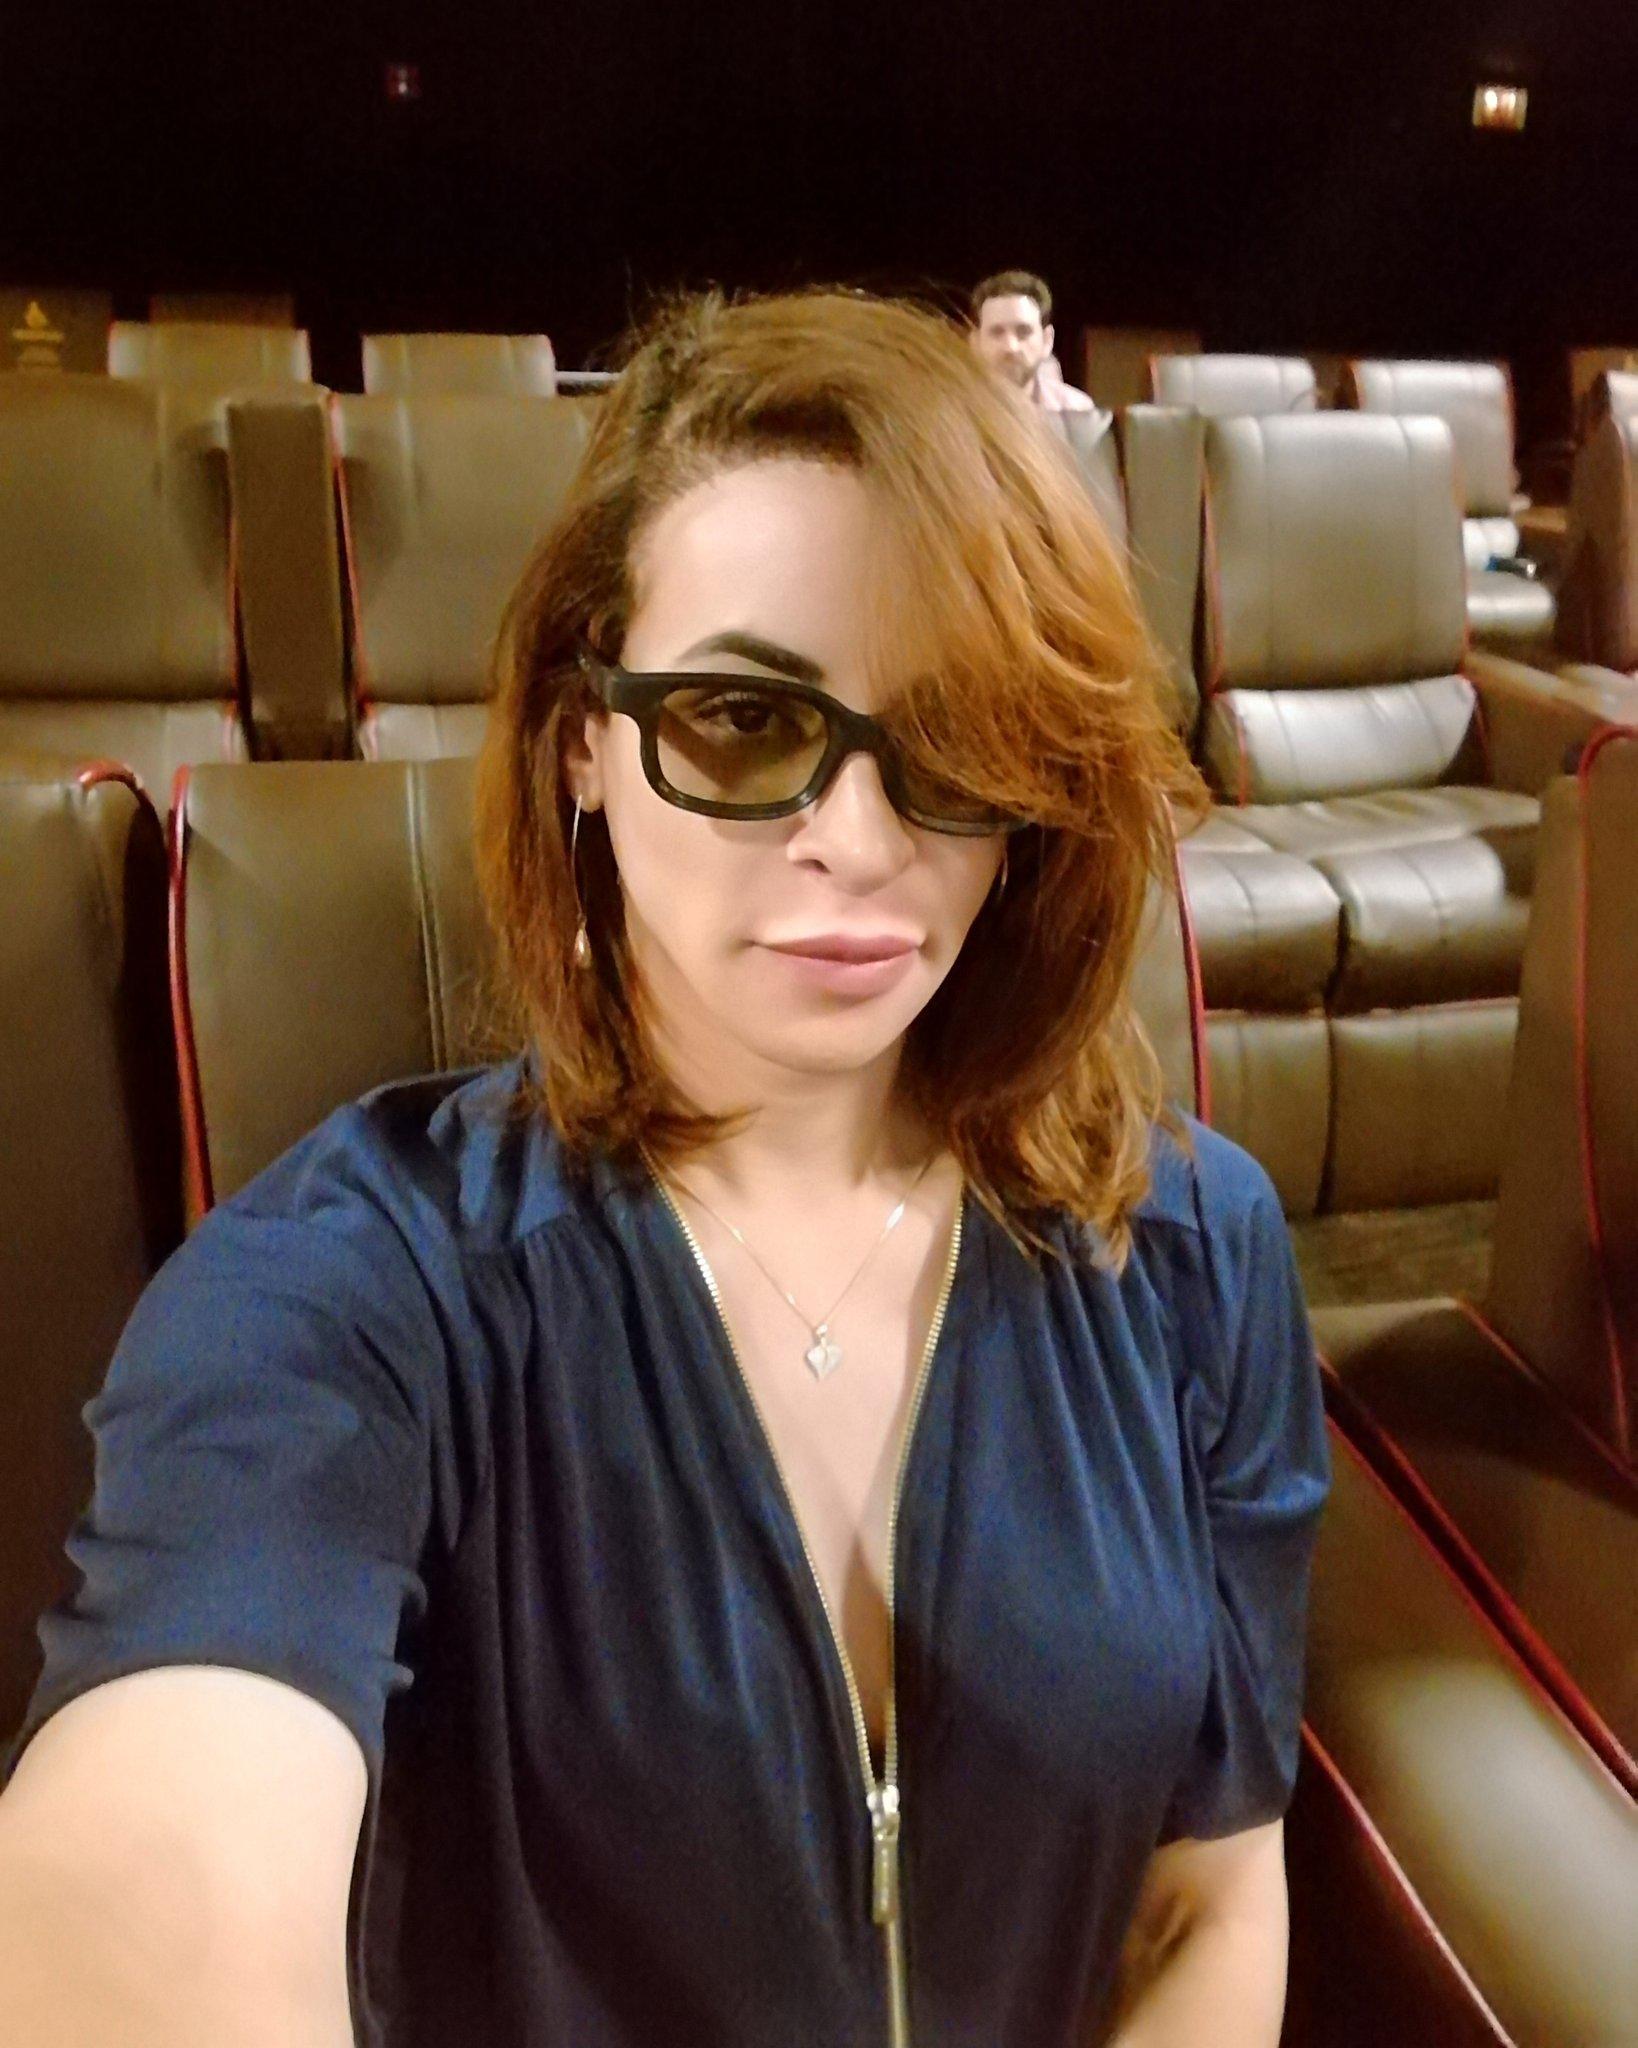 Carla Brasil on Twitter: How do you like the teachers